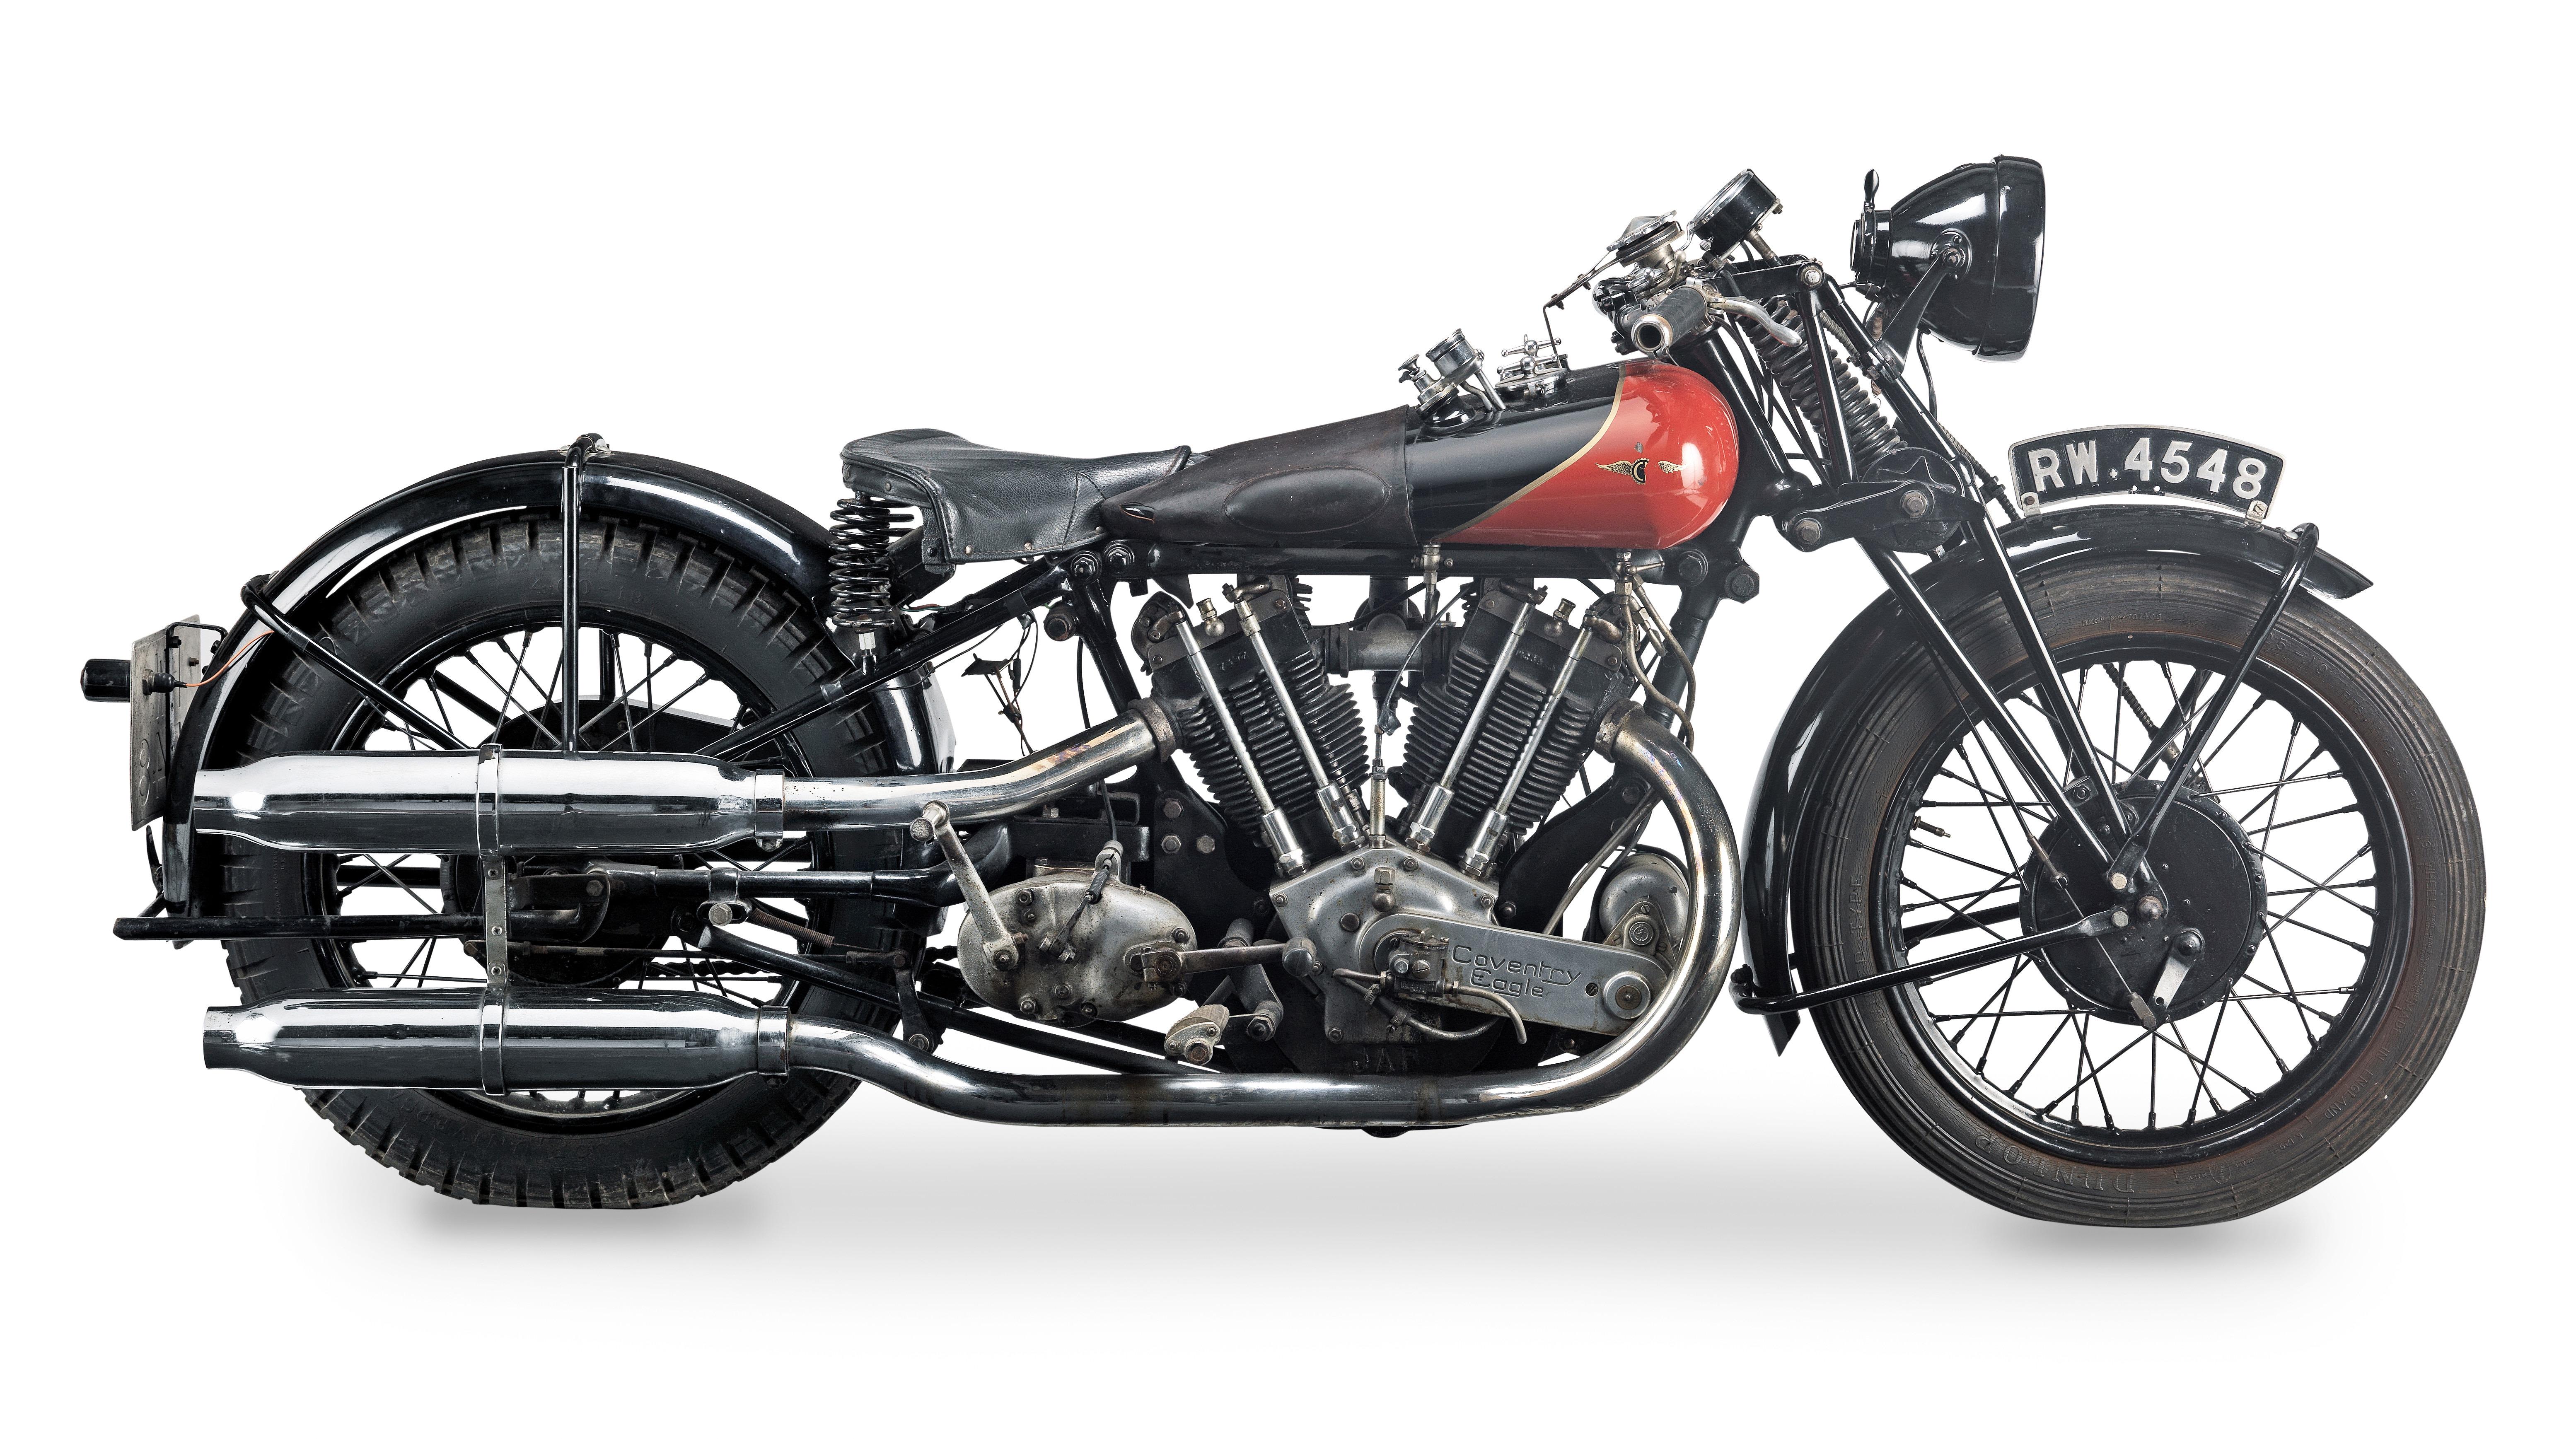 V-Twins headline Bonhams' spring motorcycle sale in England